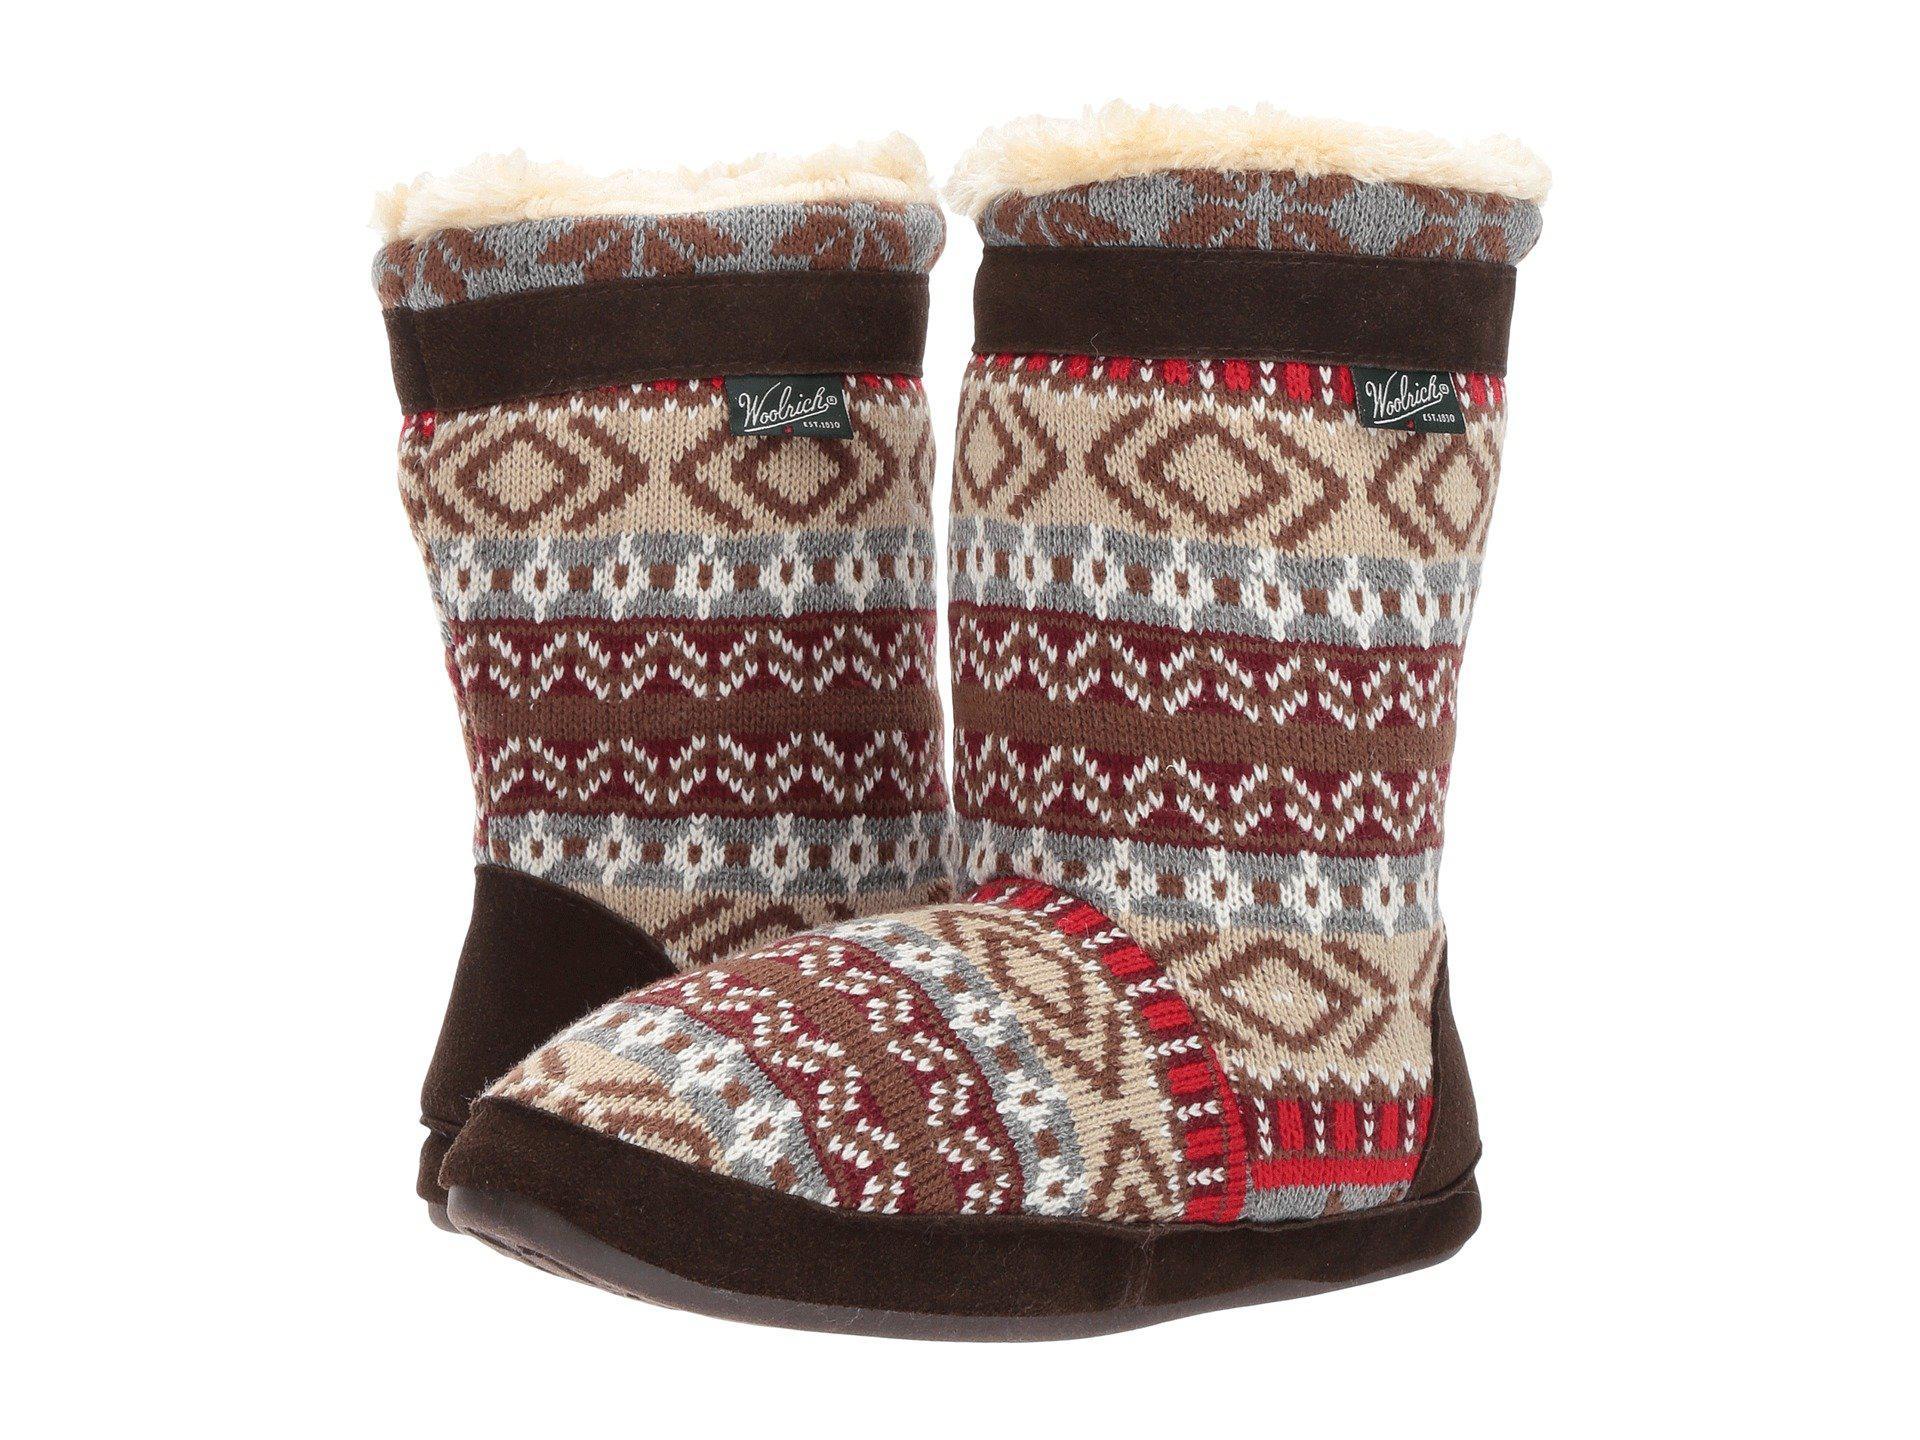 Woolrich Whitecap Knit Boot Lz0zJL